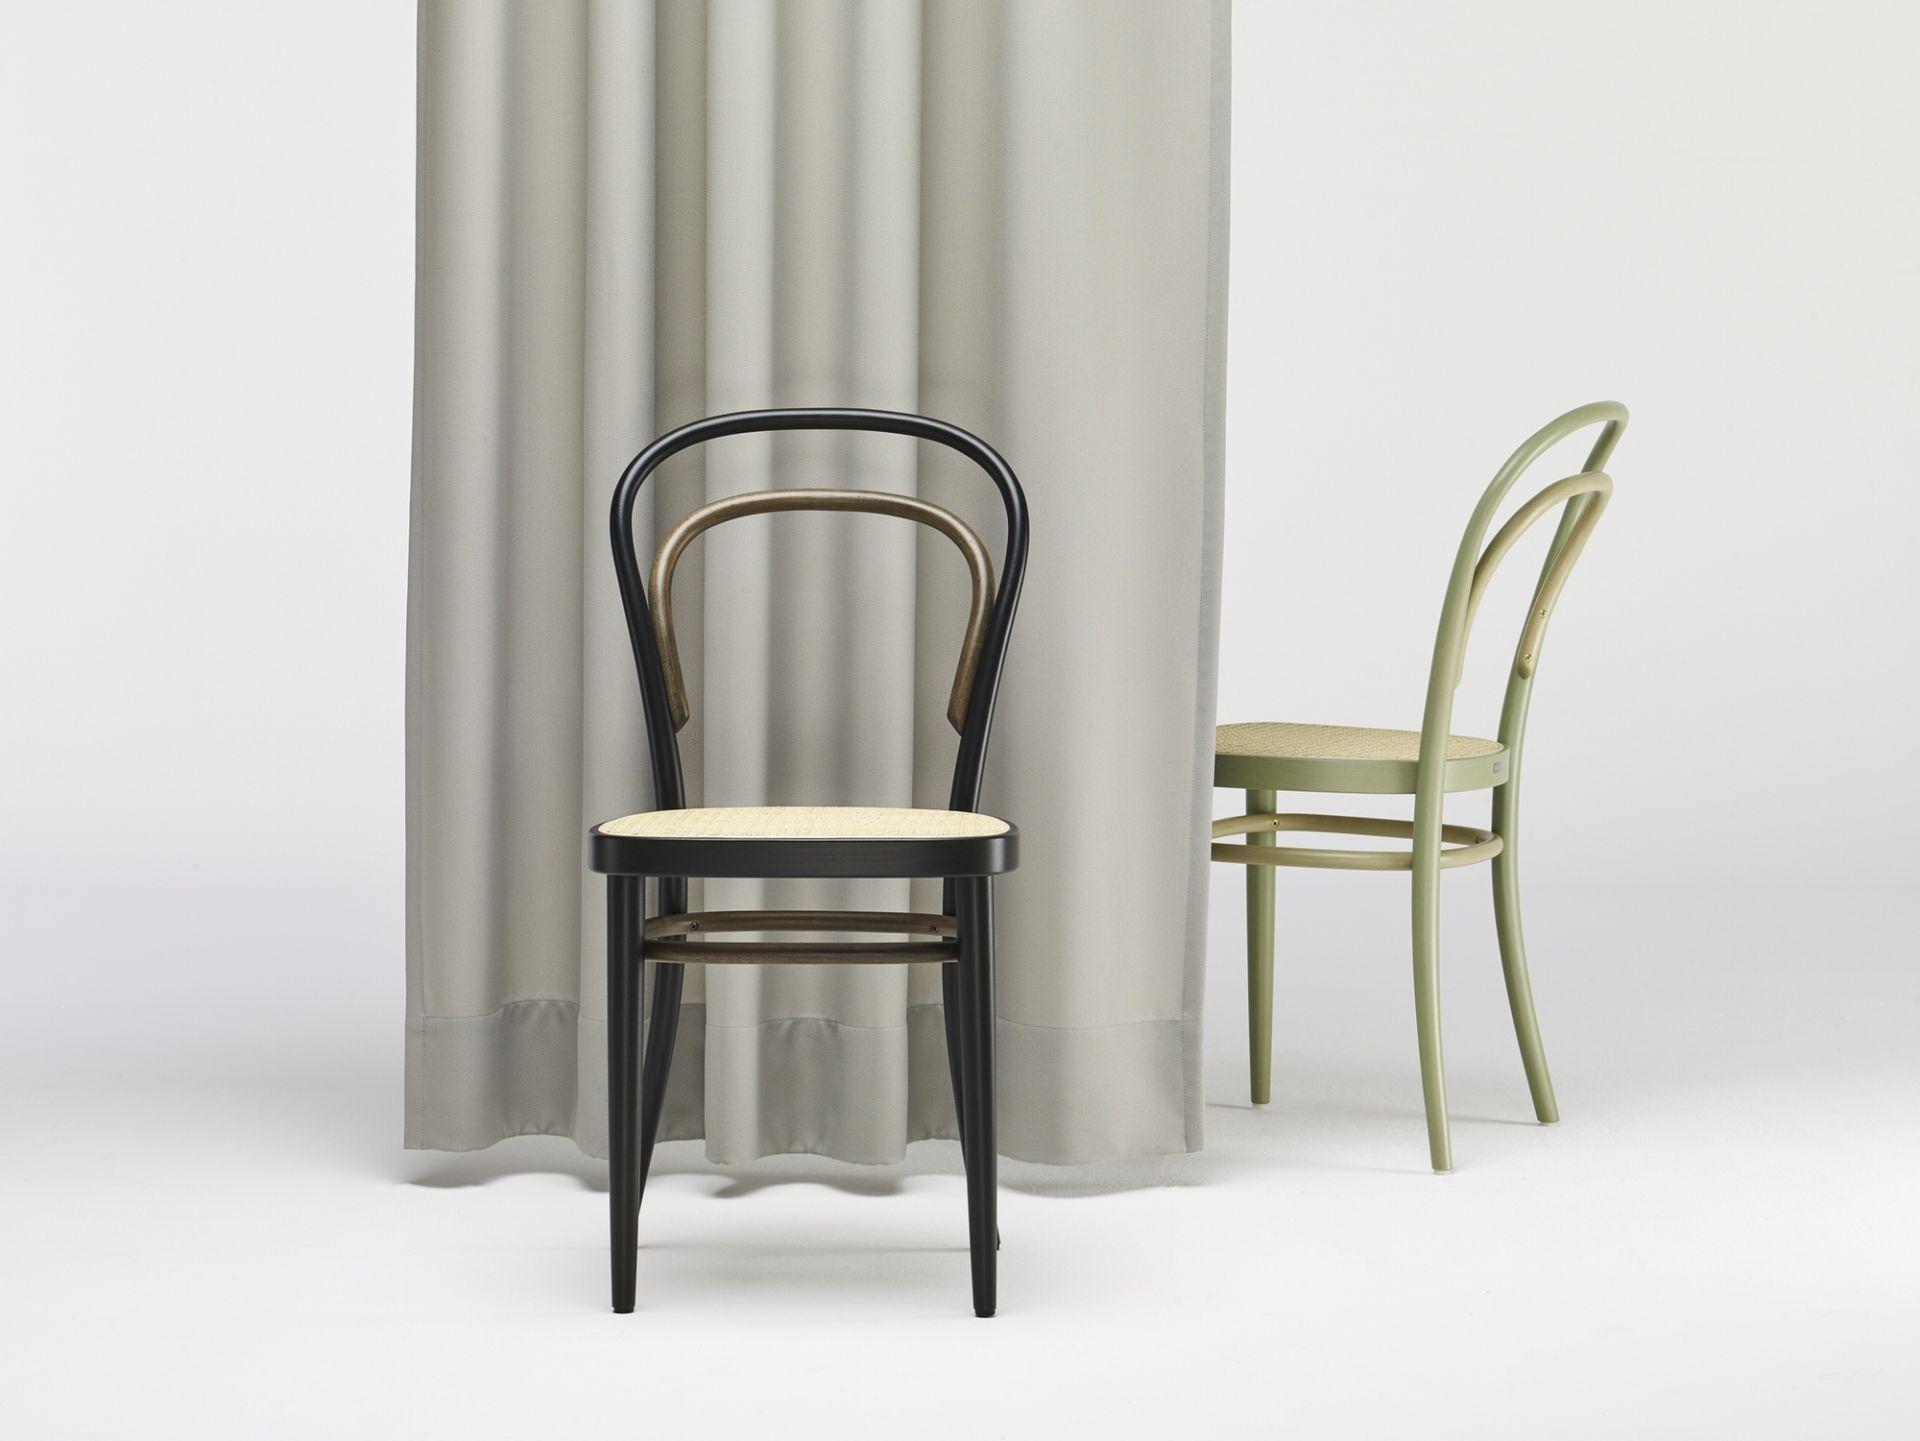 214 Two-Tone Kaffeehausstuhl Thonet Weiß